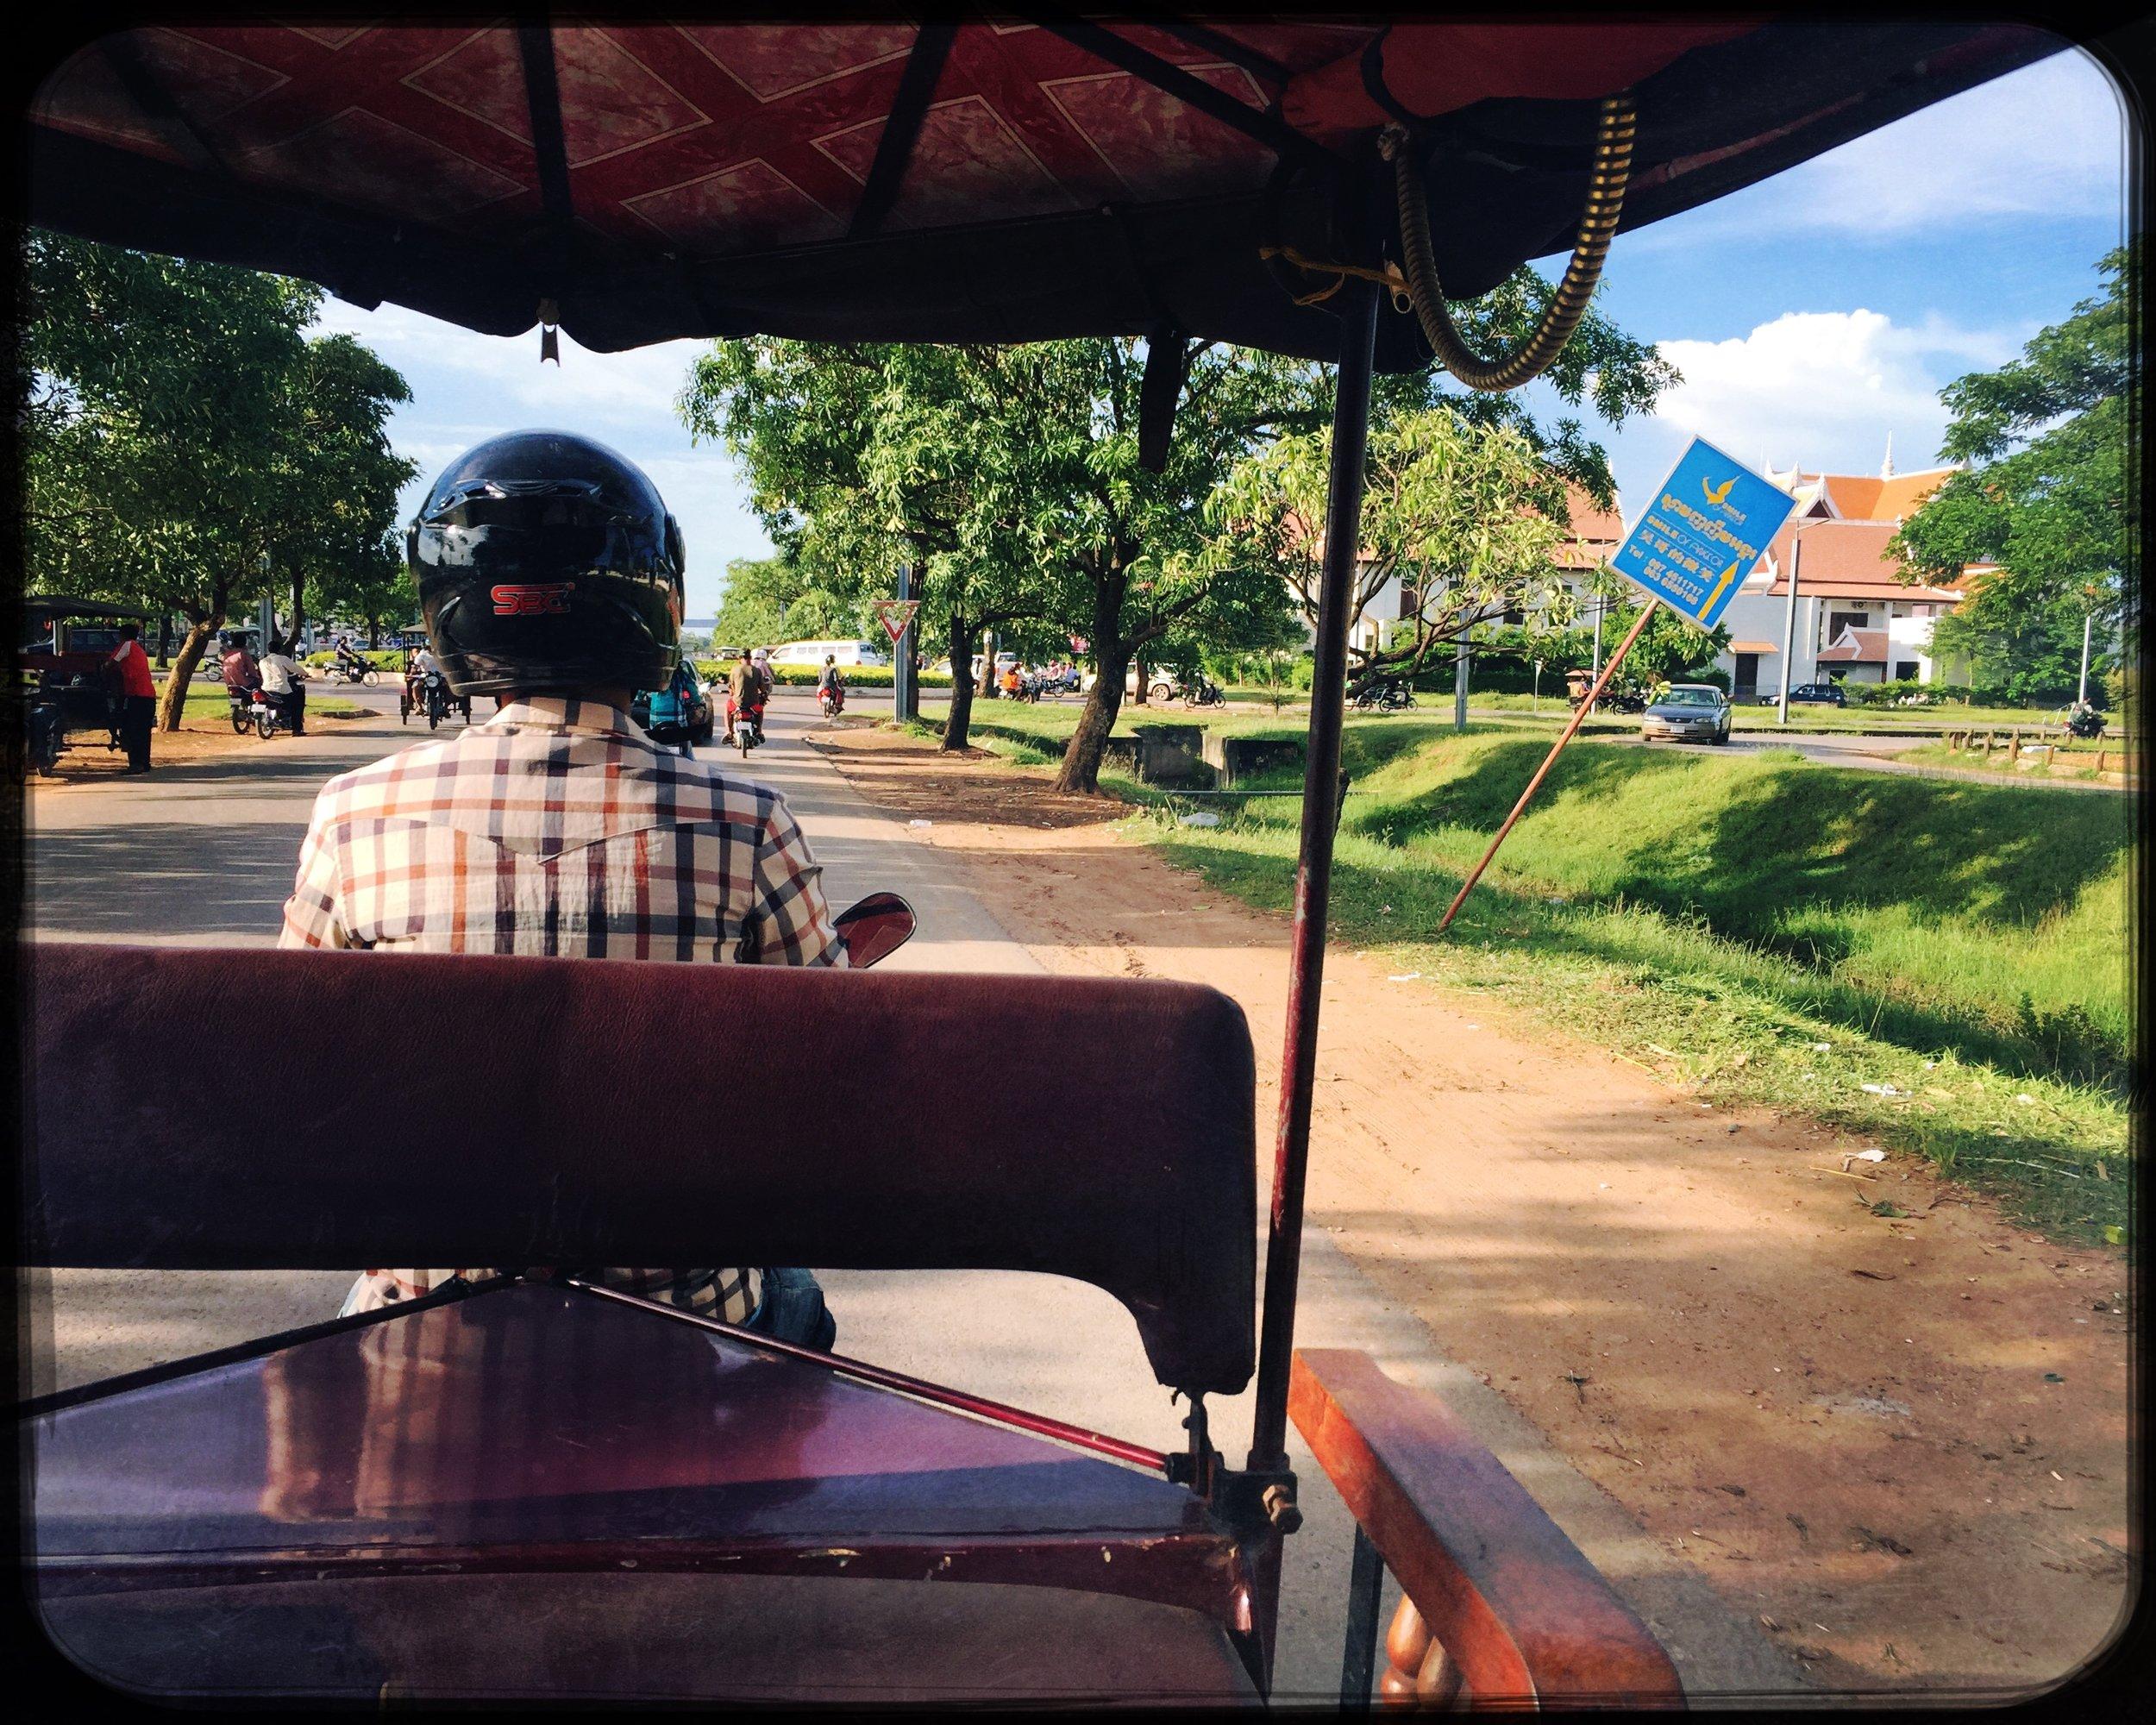 Tuk Tuk through the countryside on the way to Angkor Wat.